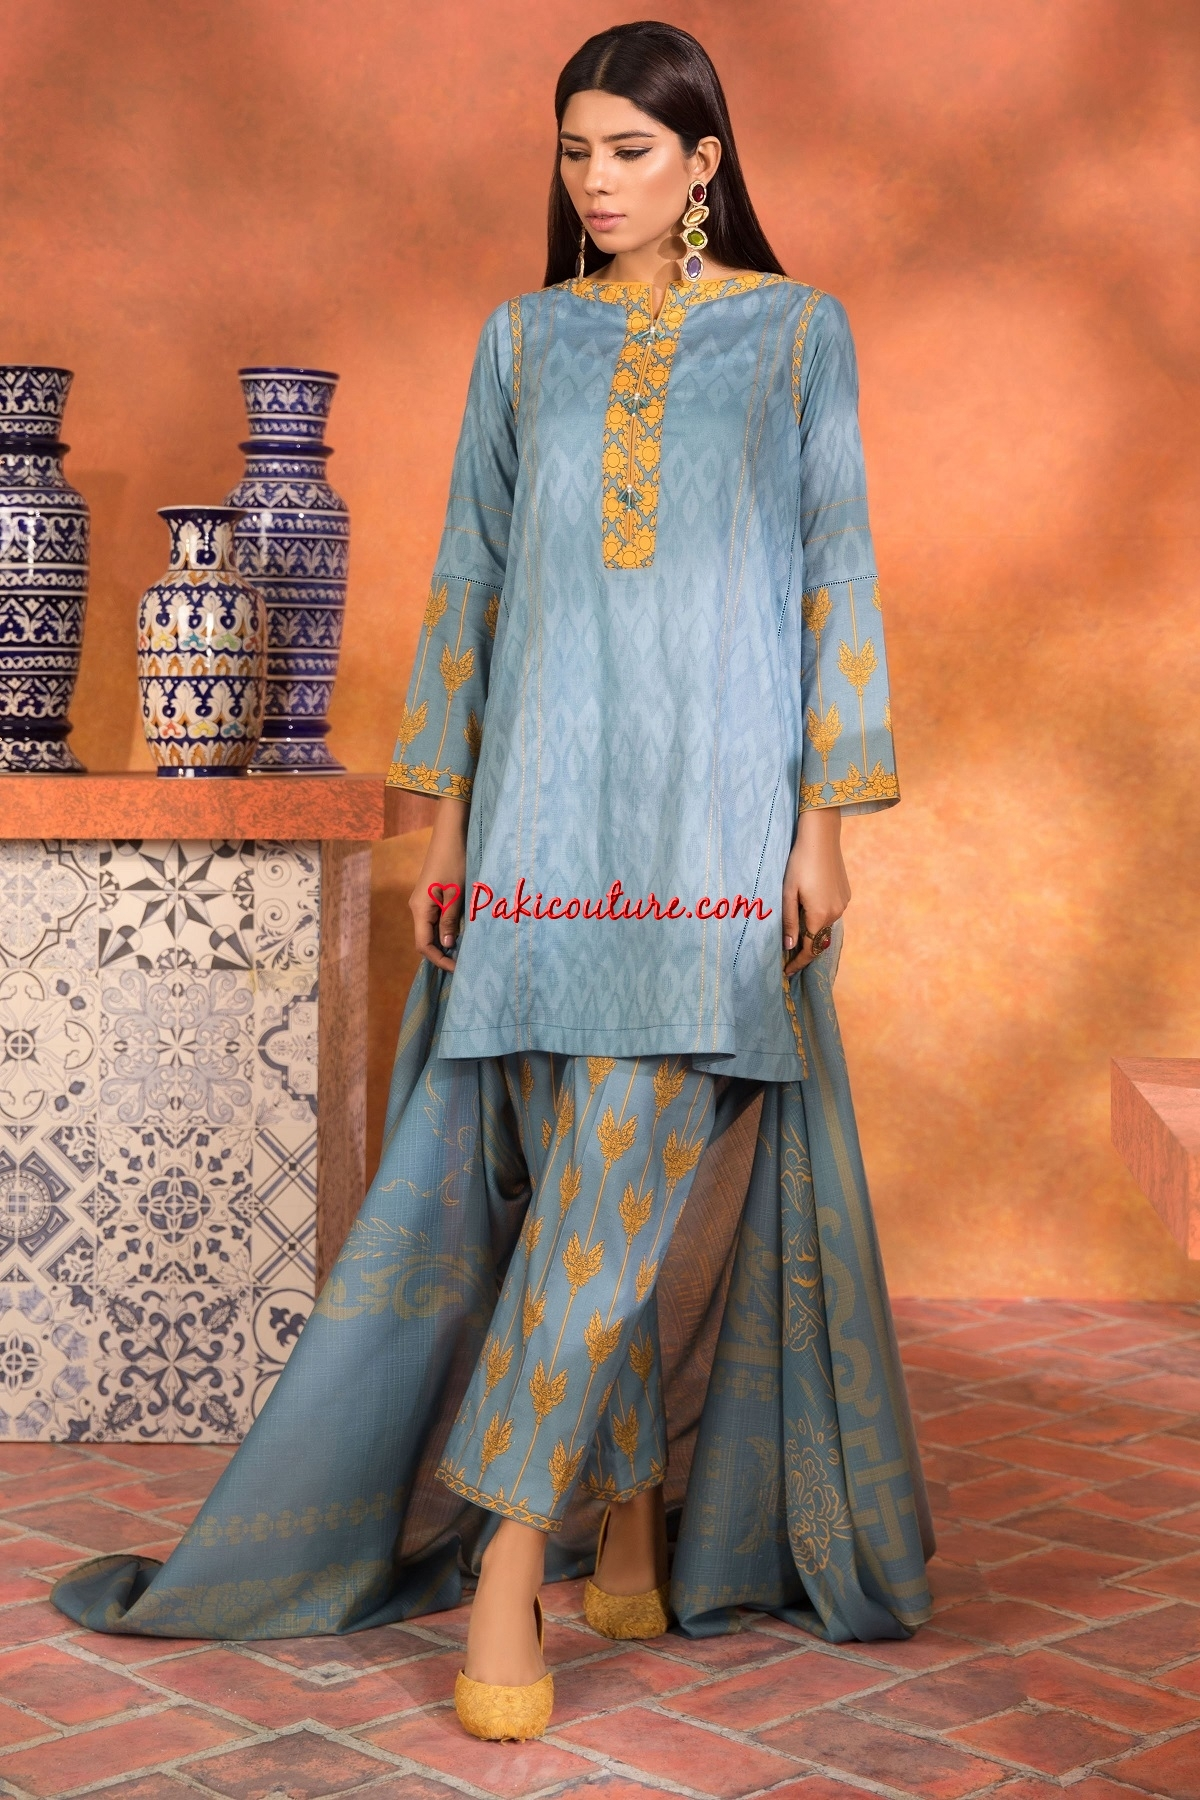 Sapphire Summer Lawn Volume II 2019 Shop Online | Buy Pakistani